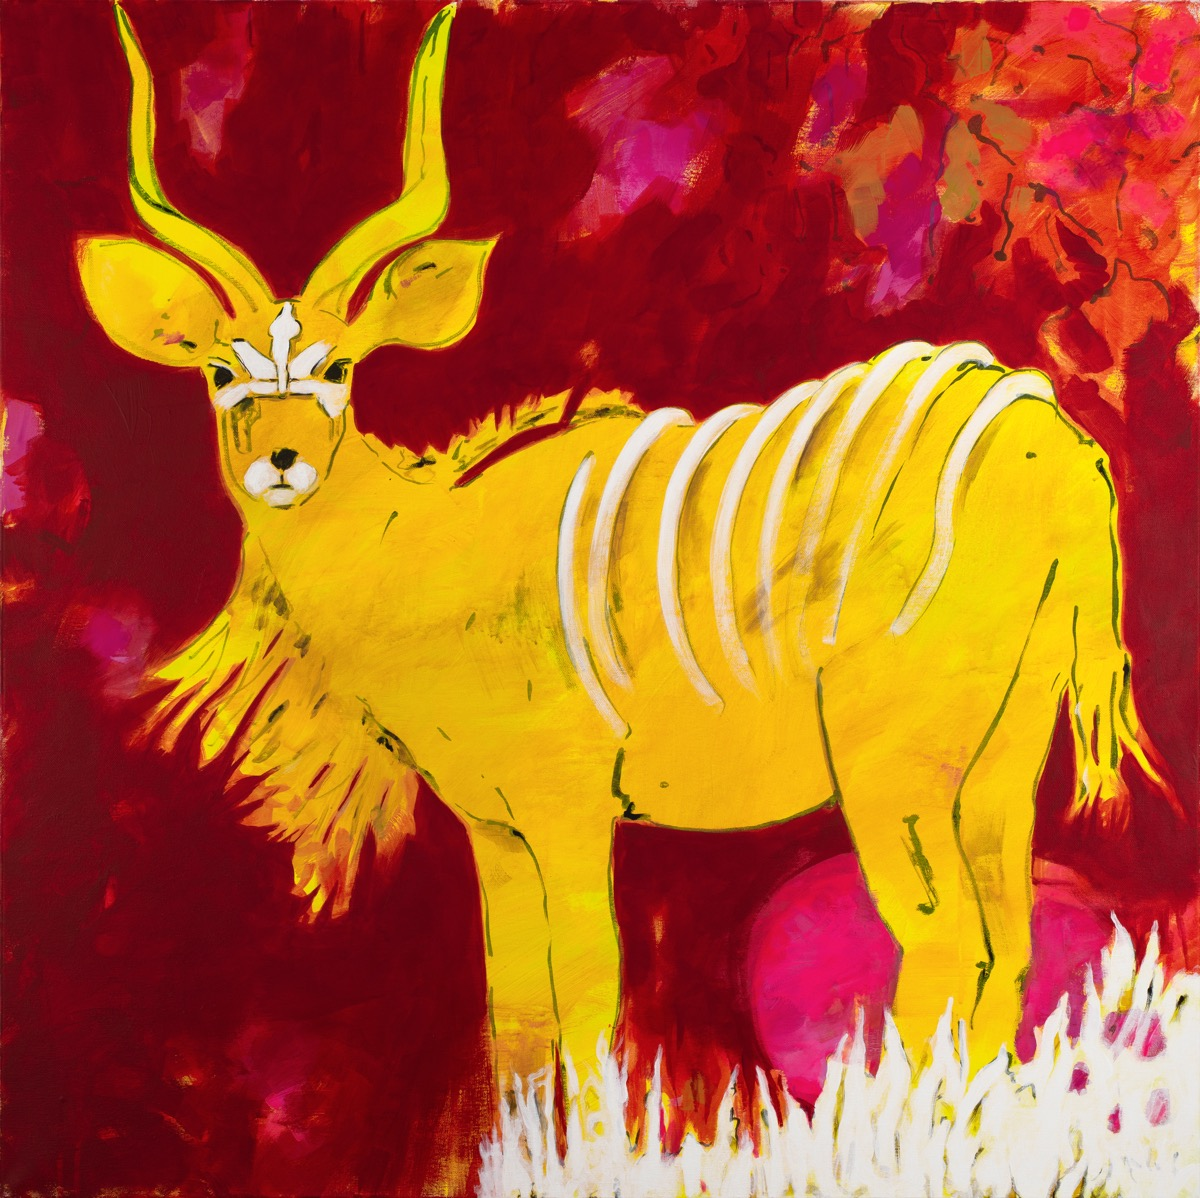 Filmstill SUPERWILDVISION Namibia 2020, Afrika, Kunstprojekt von Irene Mueller, Tier Gemaelde Kudu Antilope, Maske